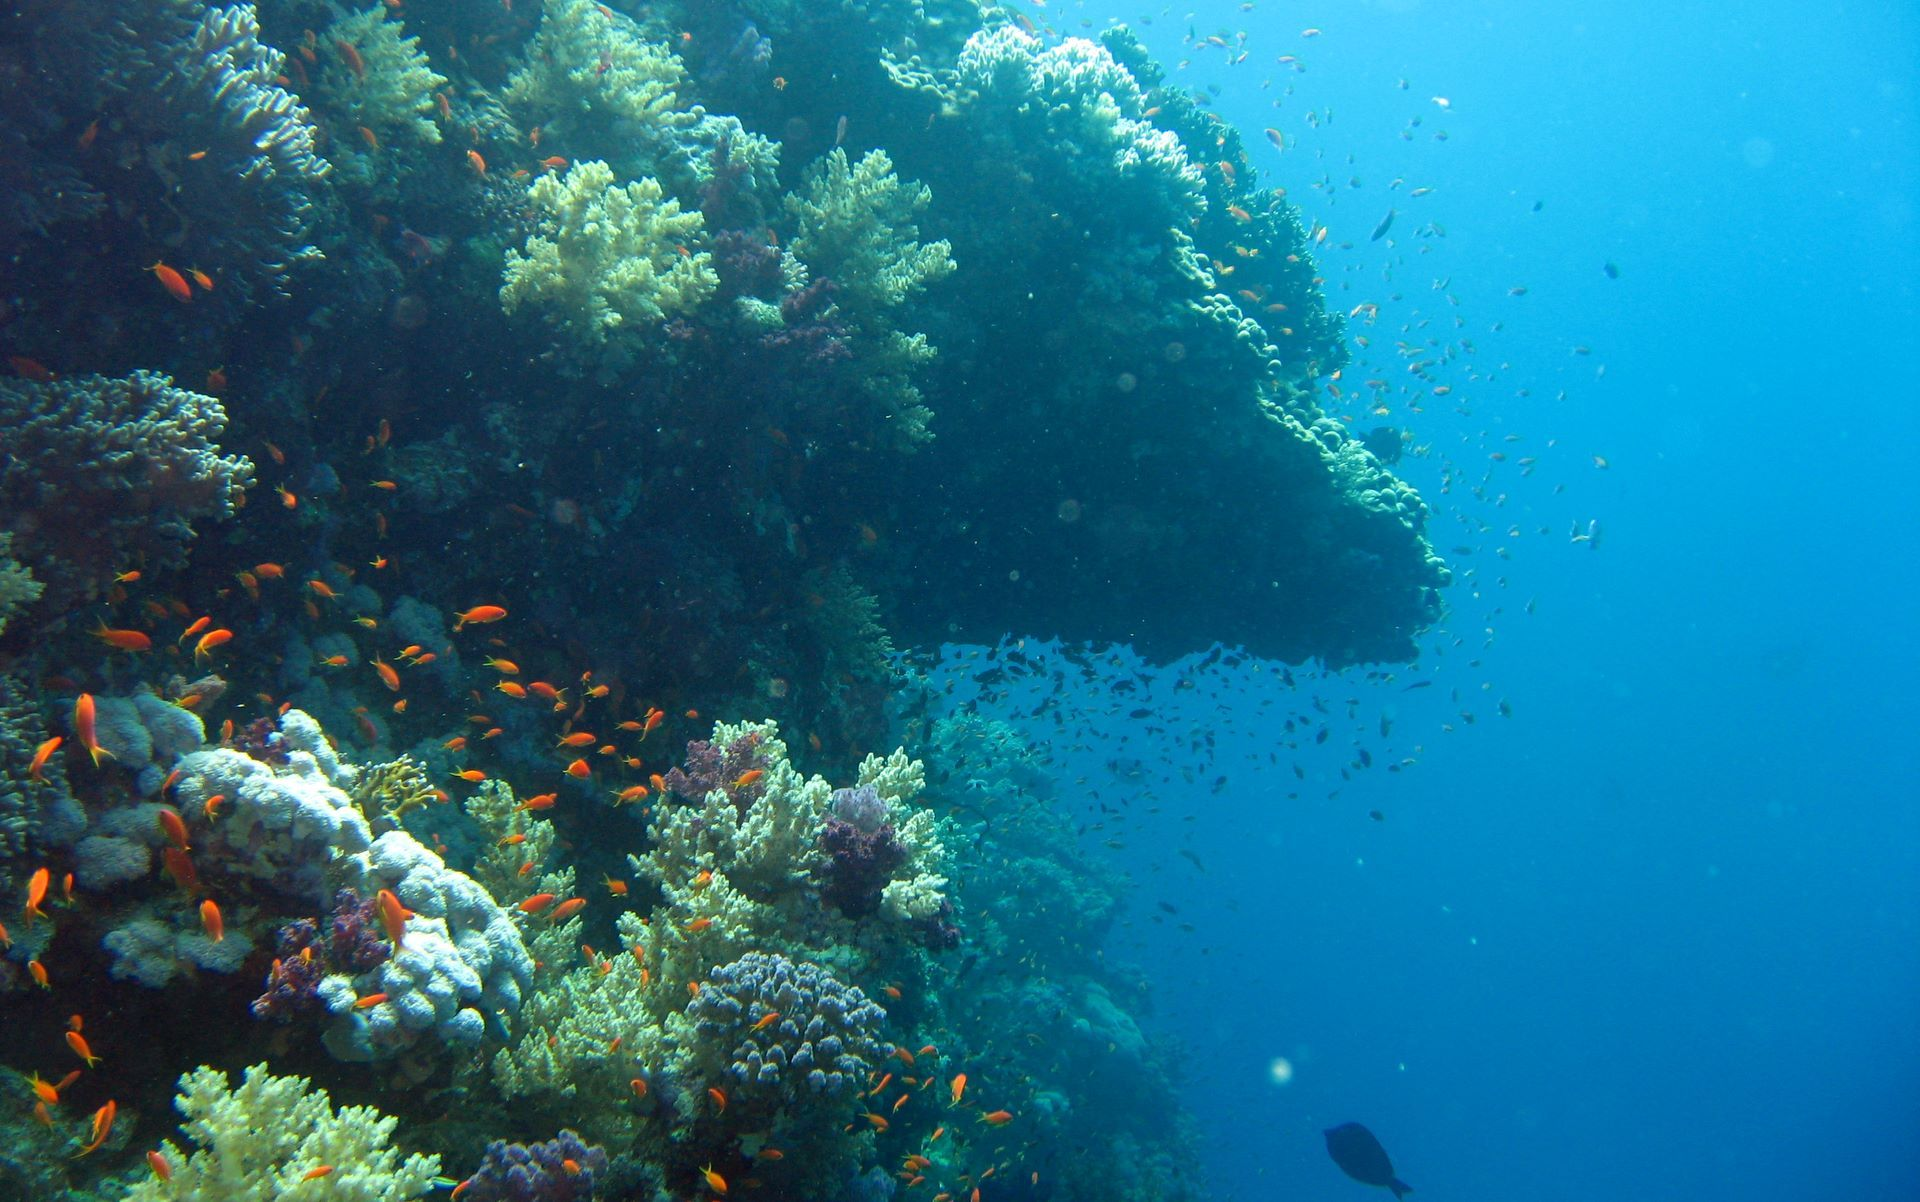 Beautiful Windows 7 Ocean Theme Underwater wallpaper